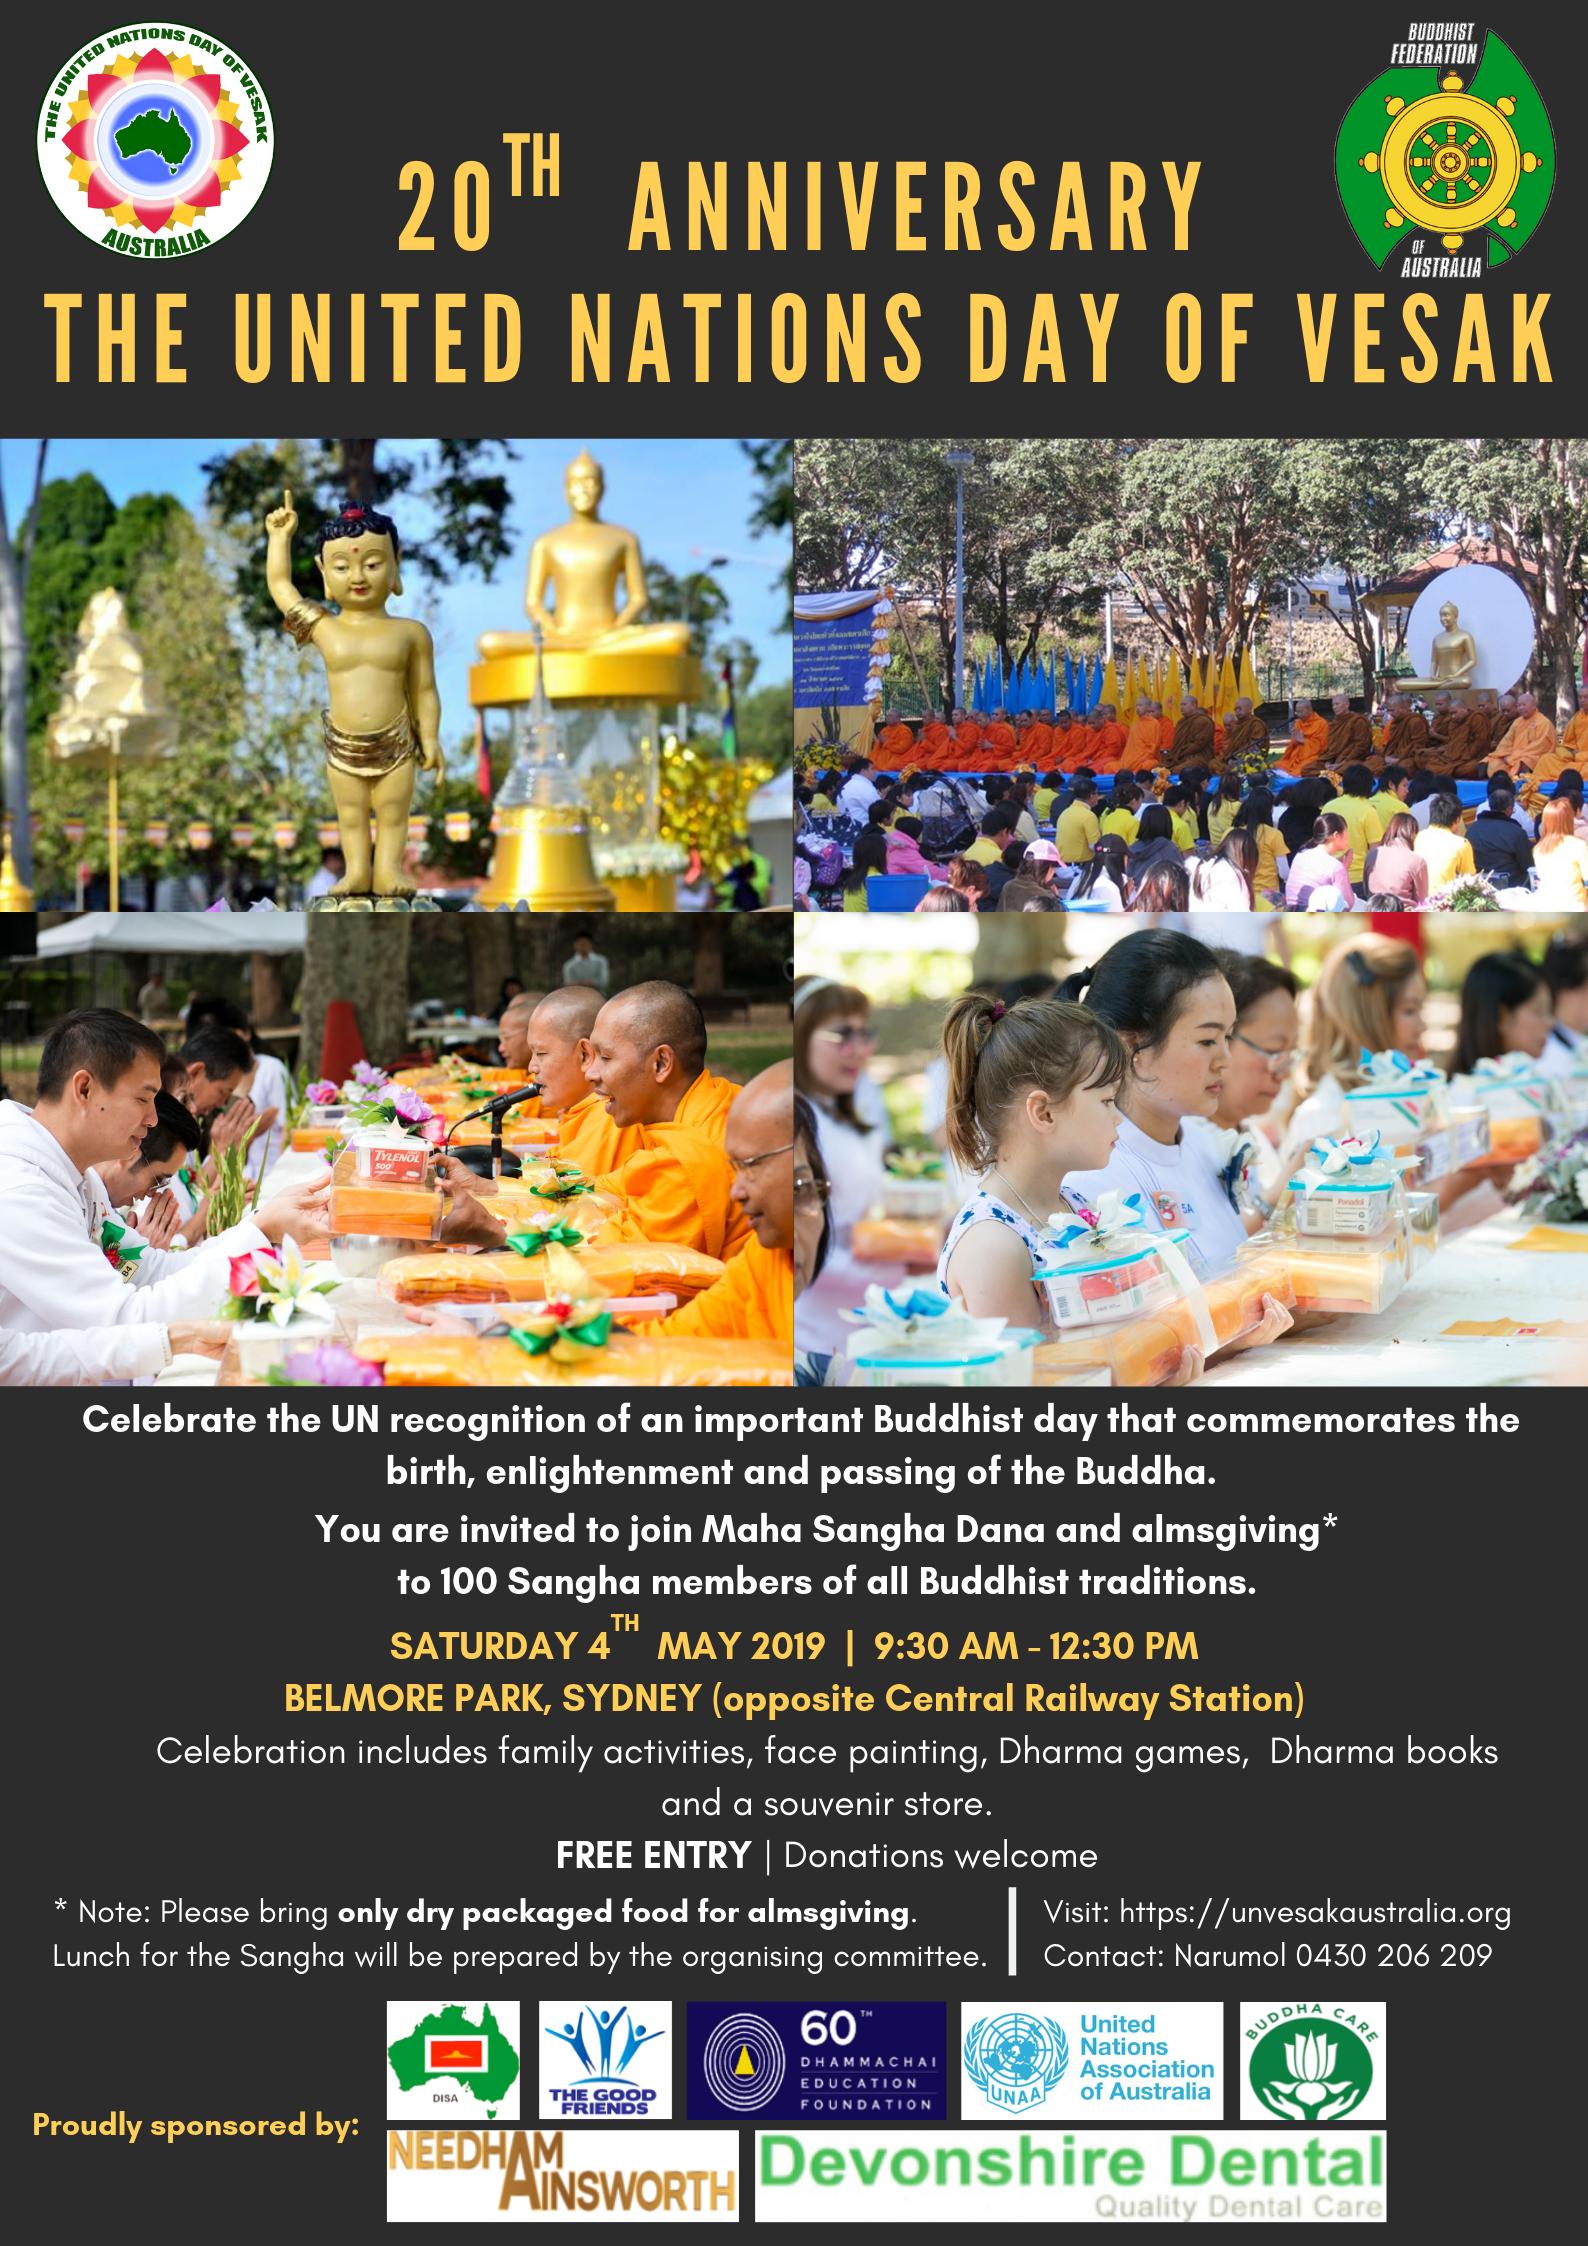 Australian Observance of the United Nations Day of Vesak – a